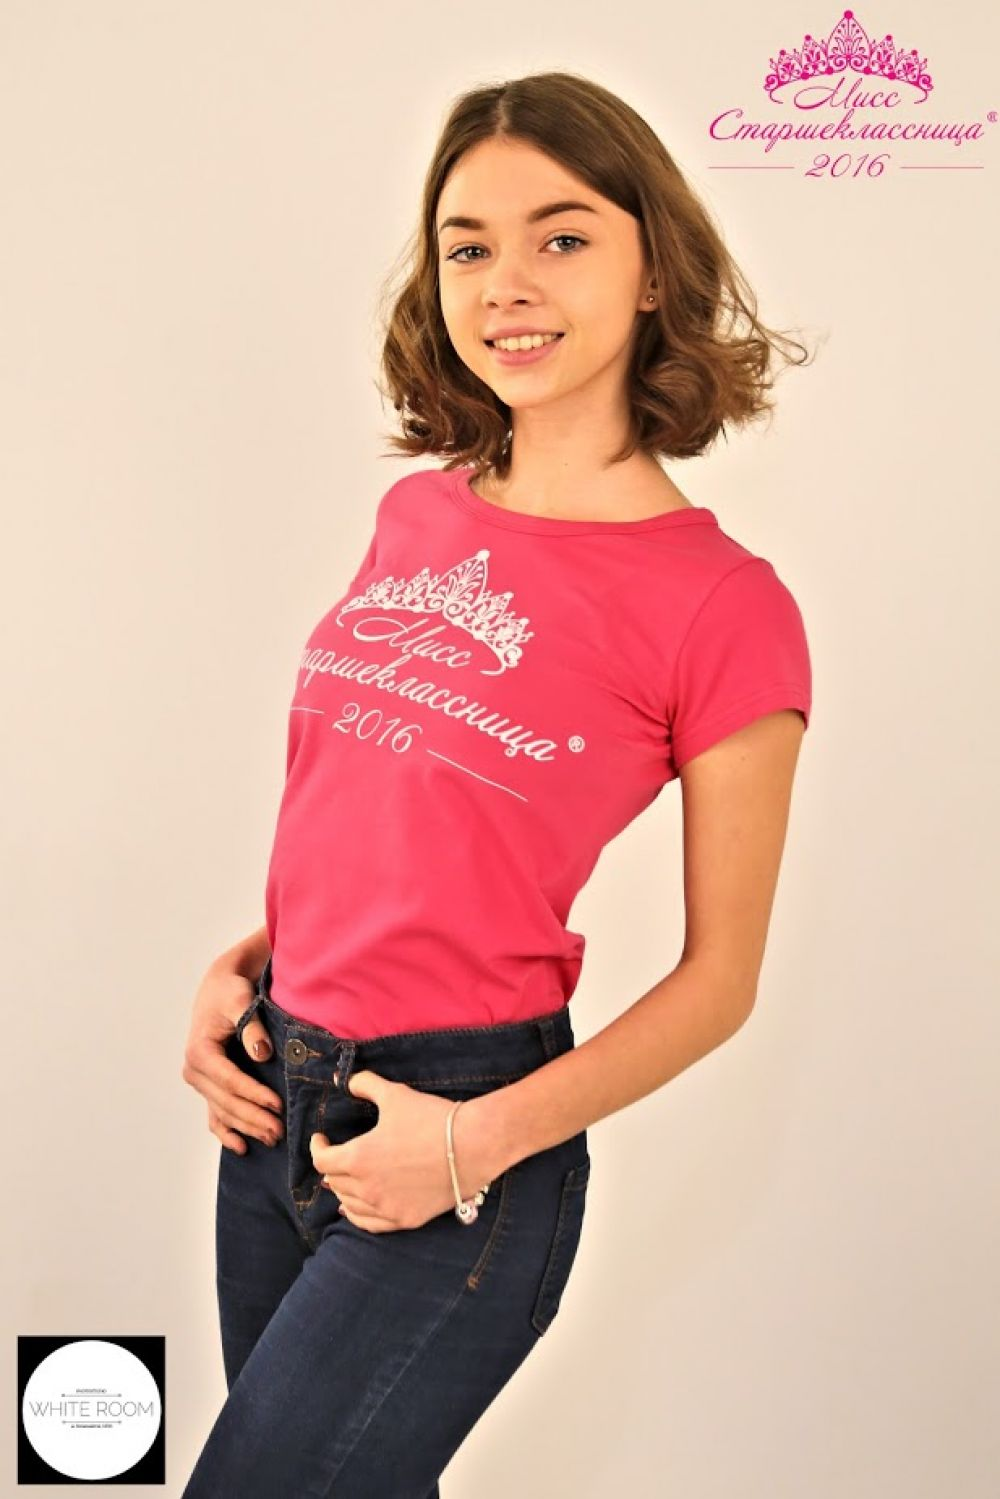 Виолетта Пешина, школа №61, 15 лет.